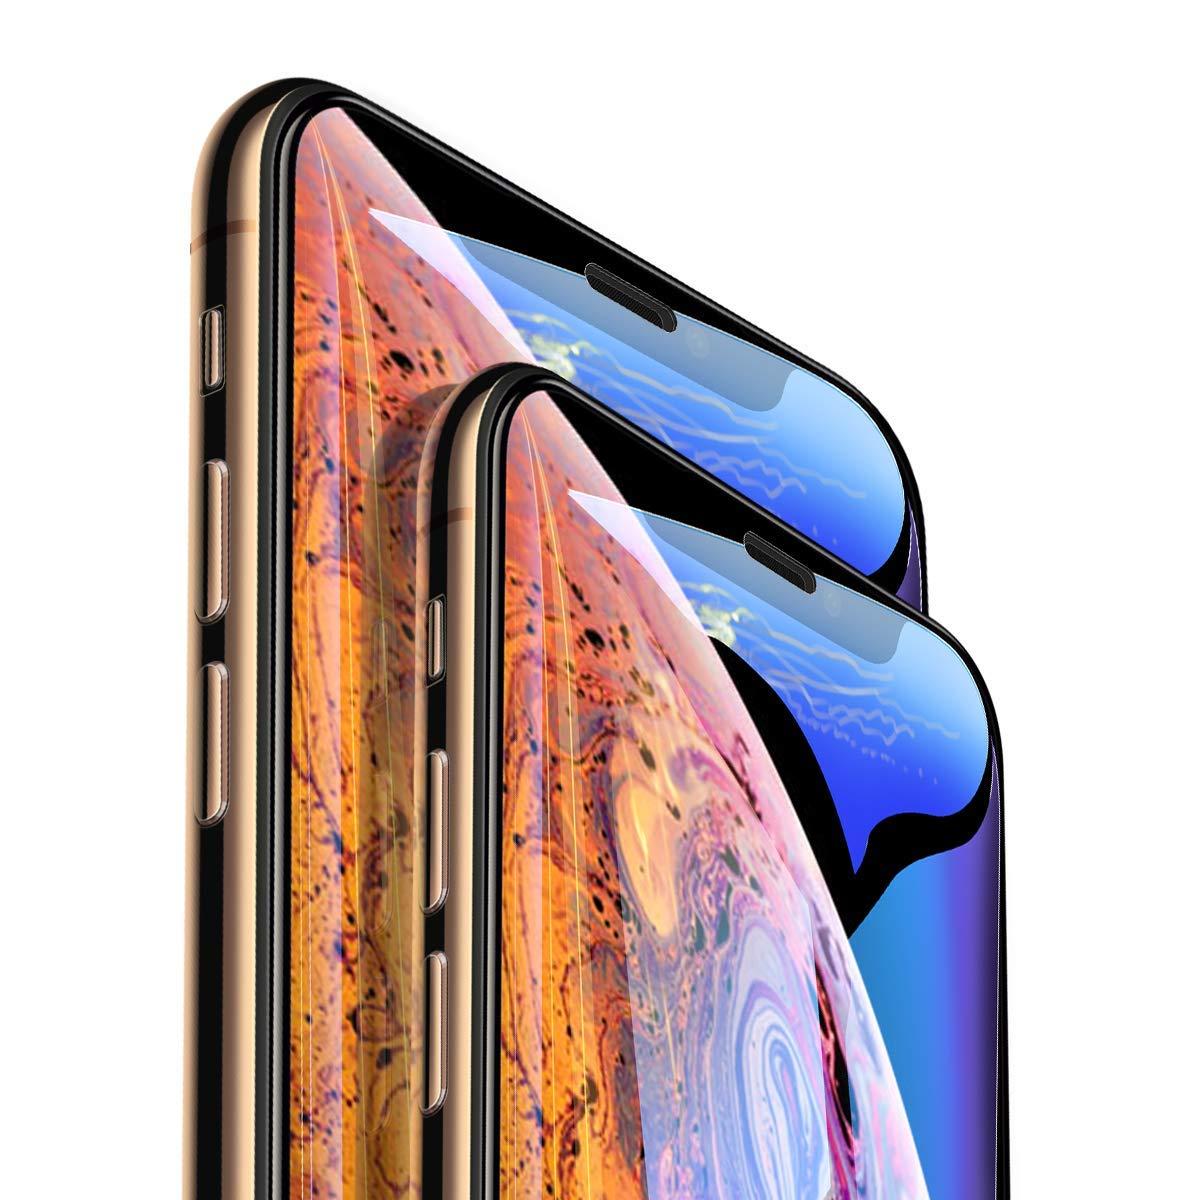 Screen Protectors for IPhone X Max, IPhone XR, IPad Pro from $2.63 | Cases for iPhone XR & IPhone Xs Max from $2.98 + FSSS